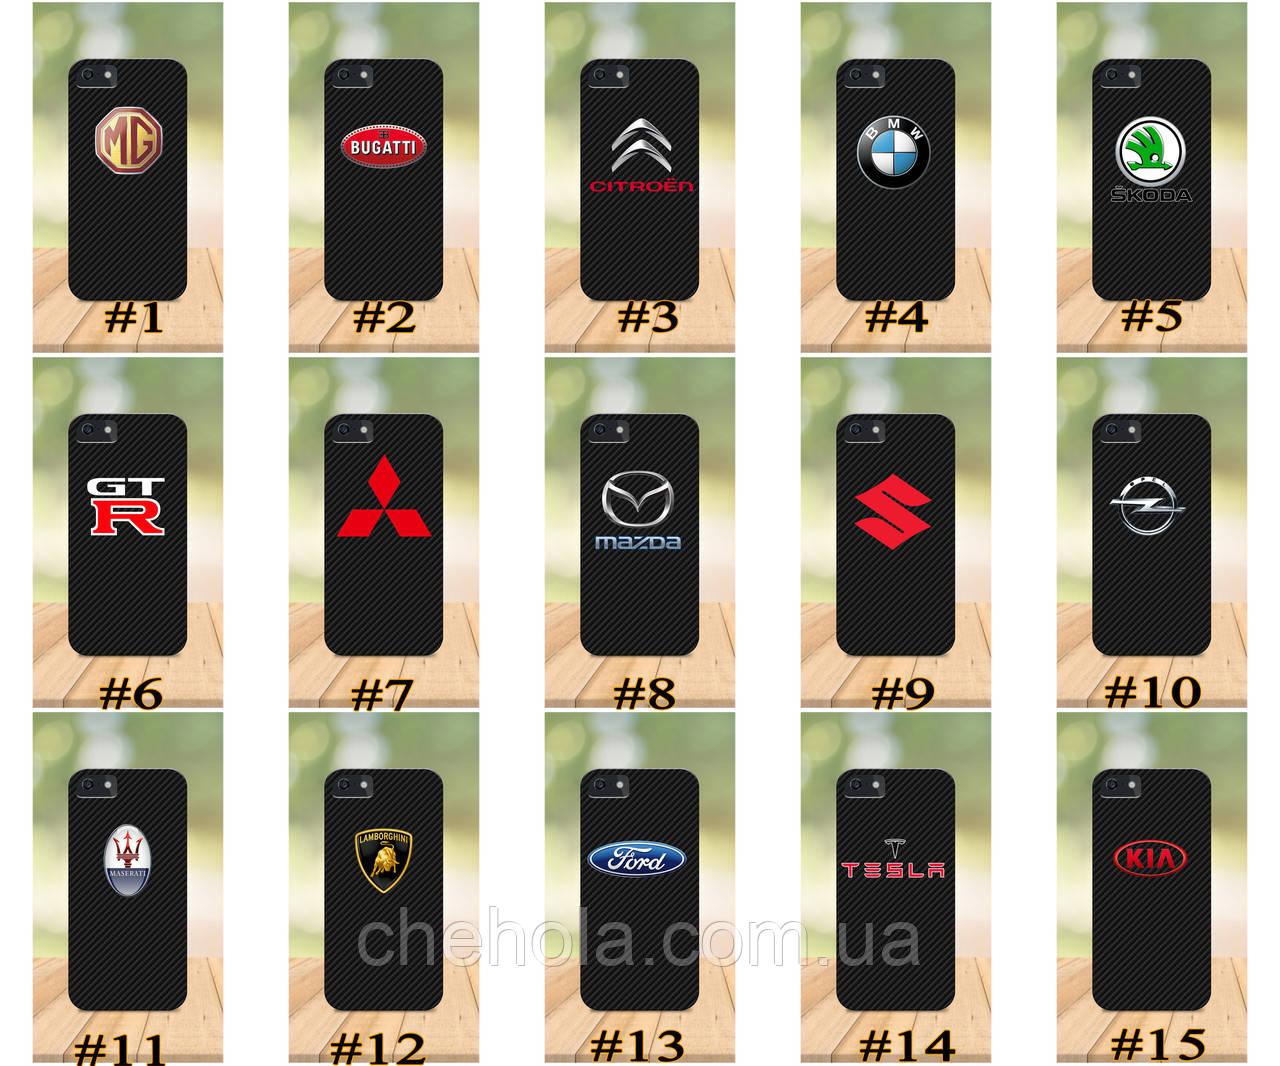 Чохол на iPhone 5 5s SE 4 4S бампер накладка з принтом бампер накладка з принтом авто марка з номером